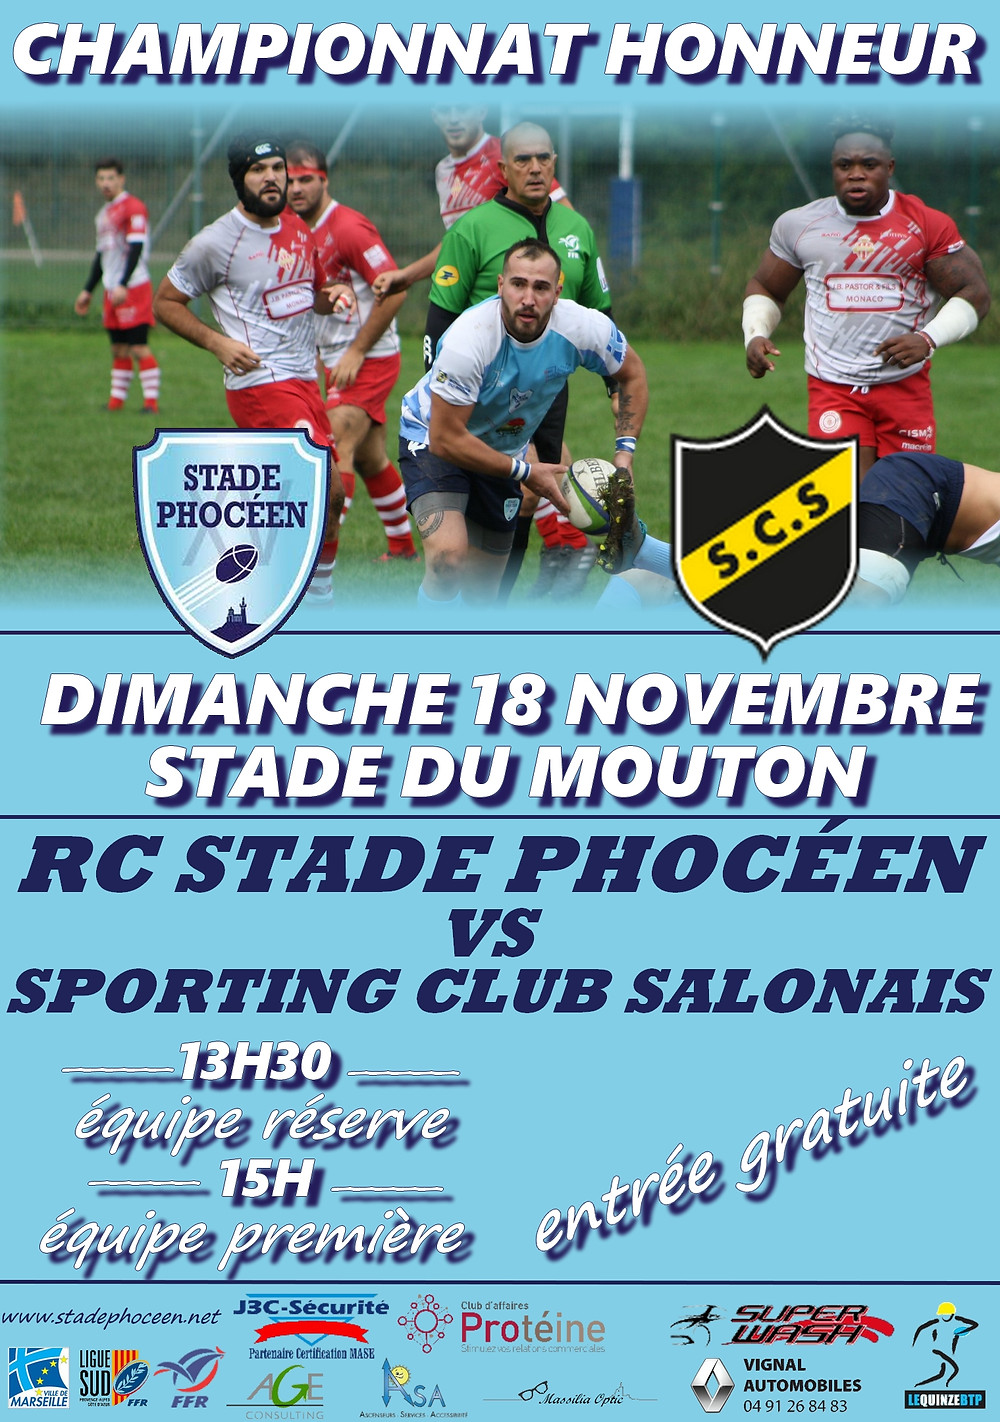 RC Stade Phoceen